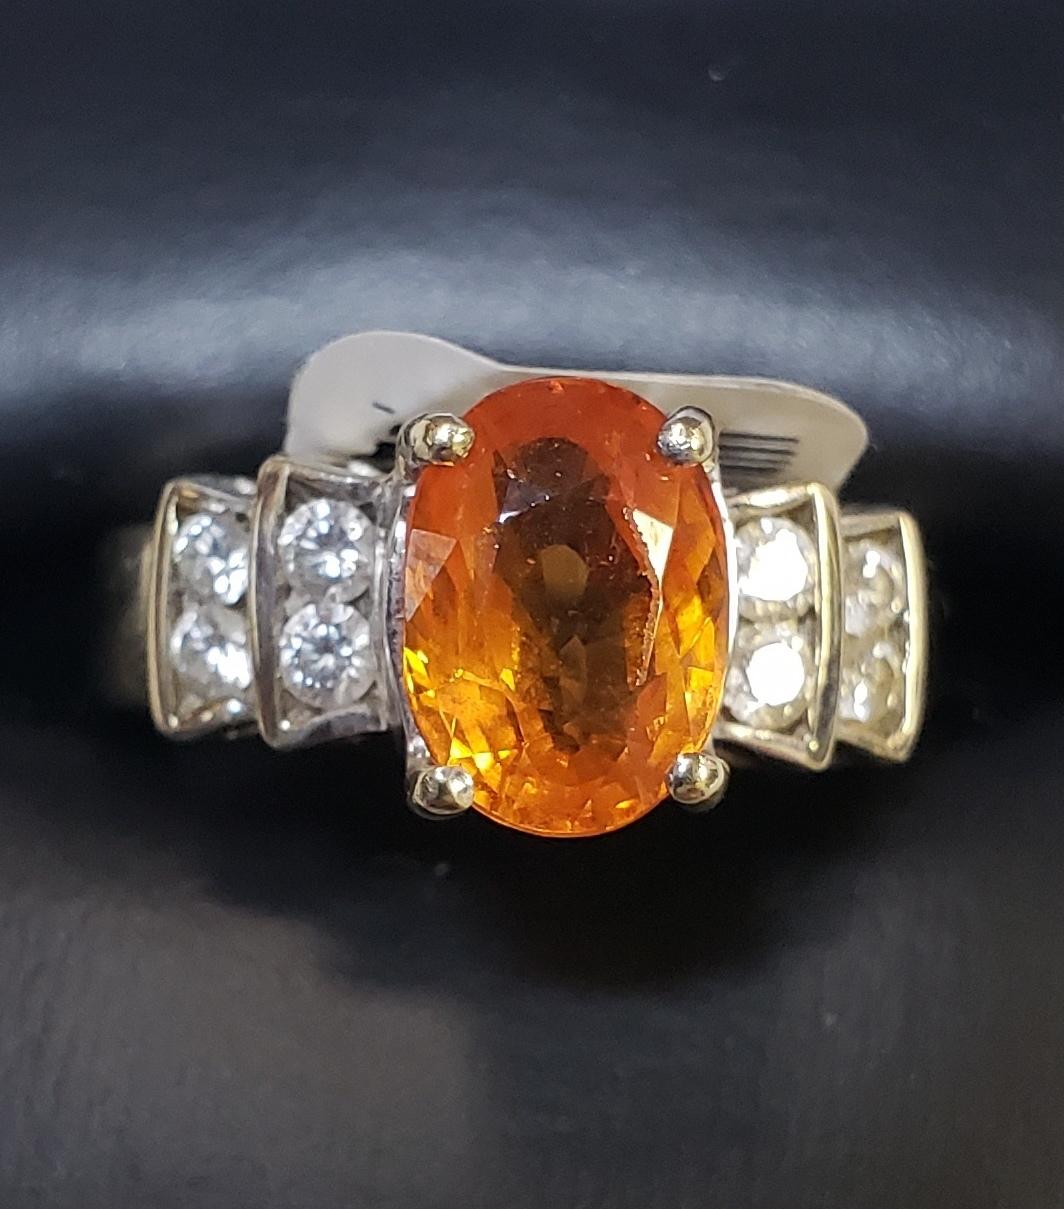 18KT - YELLOW GOLD - OVAL SPESSARTITE GARNET & APP. 3/8 CT TW DIAMOND RING